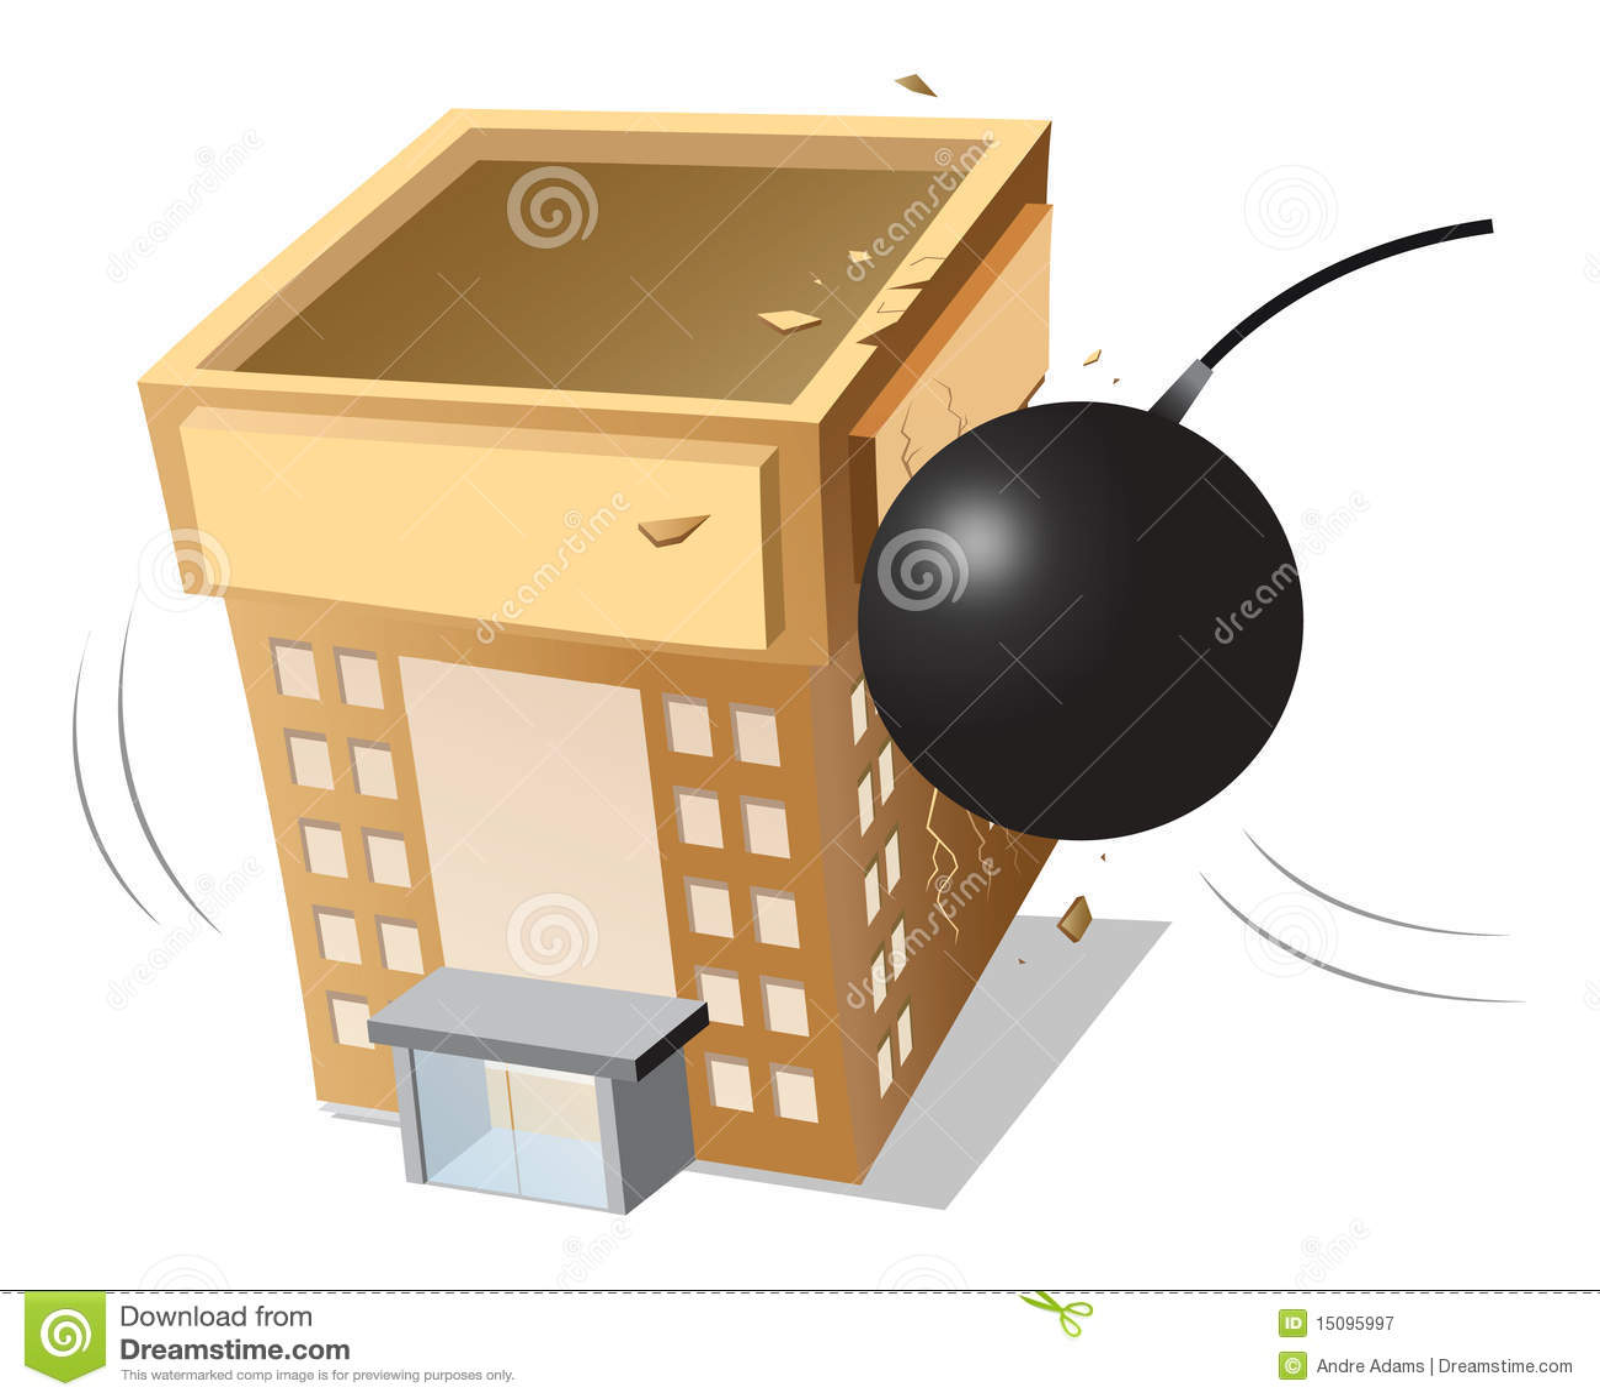 Building Demolition Cartoon : Building demolished royalty free stock photography image